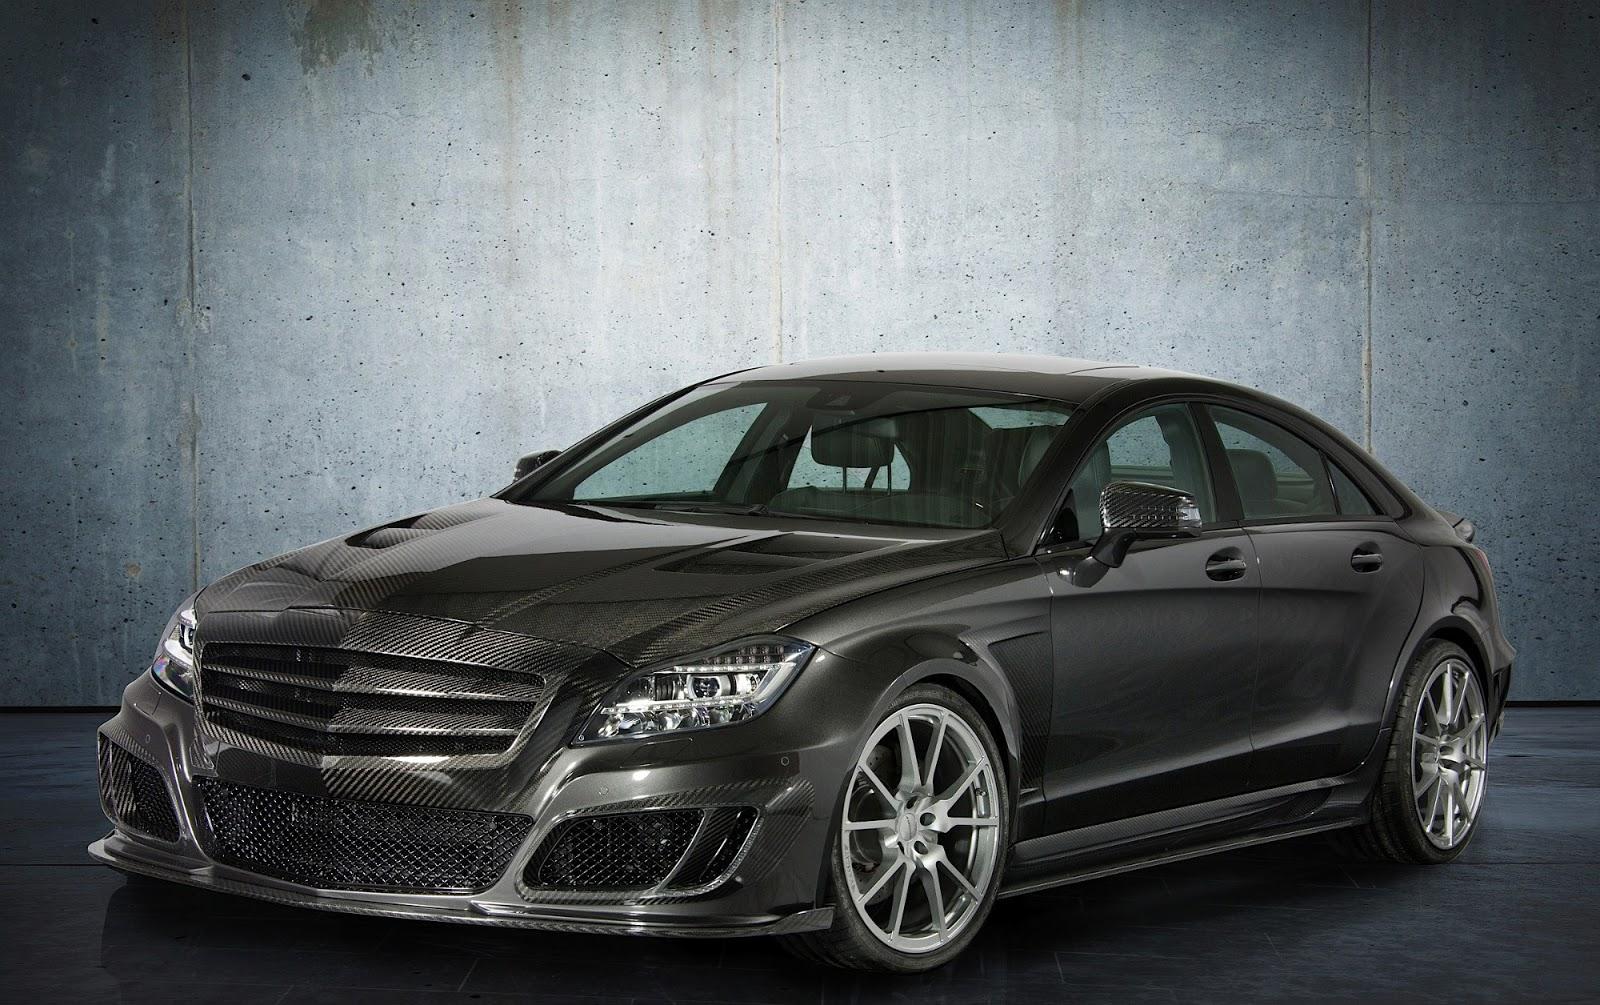 mercedes cls 63 amg shooting brake cars prices specs luxury cars wallpaper blog. Black Bedroom Furniture Sets. Home Design Ideas